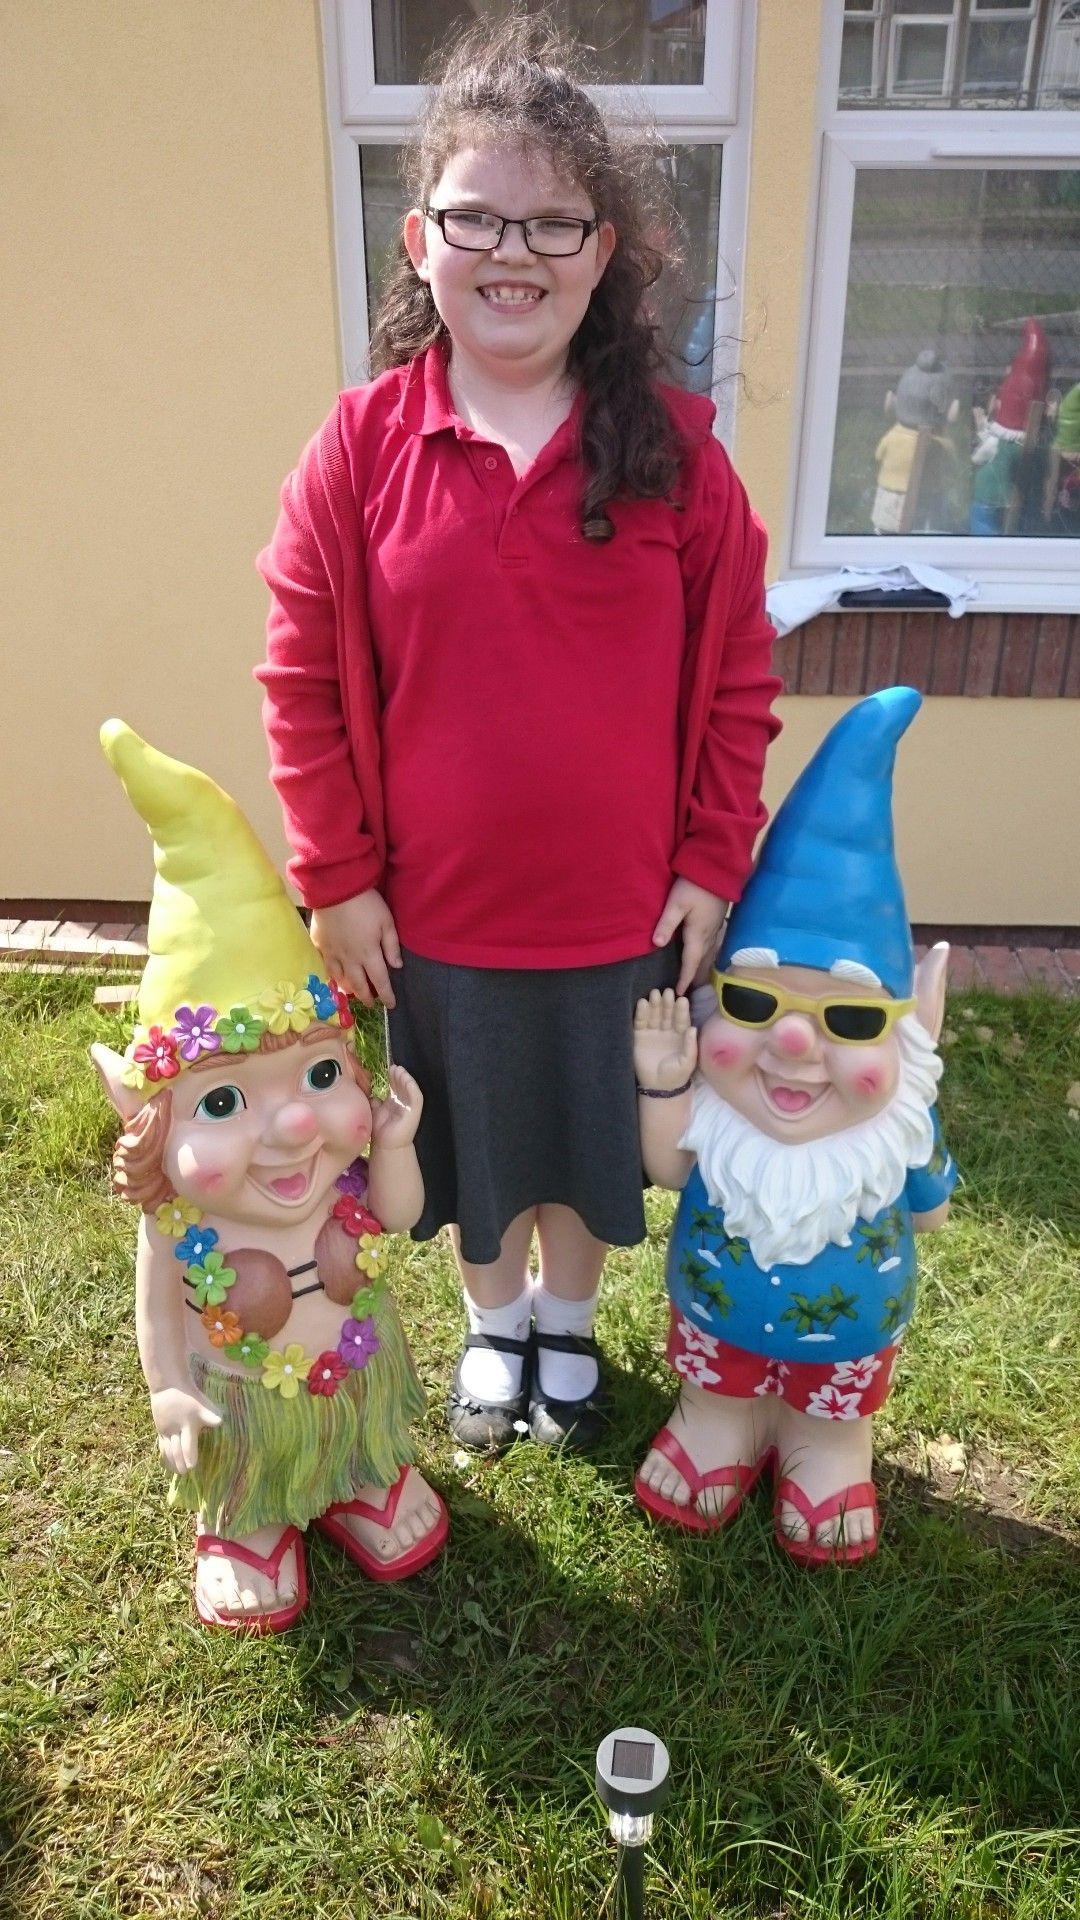 gnomes image by Kayla L Heydt Asda gnomes, Gnome garden